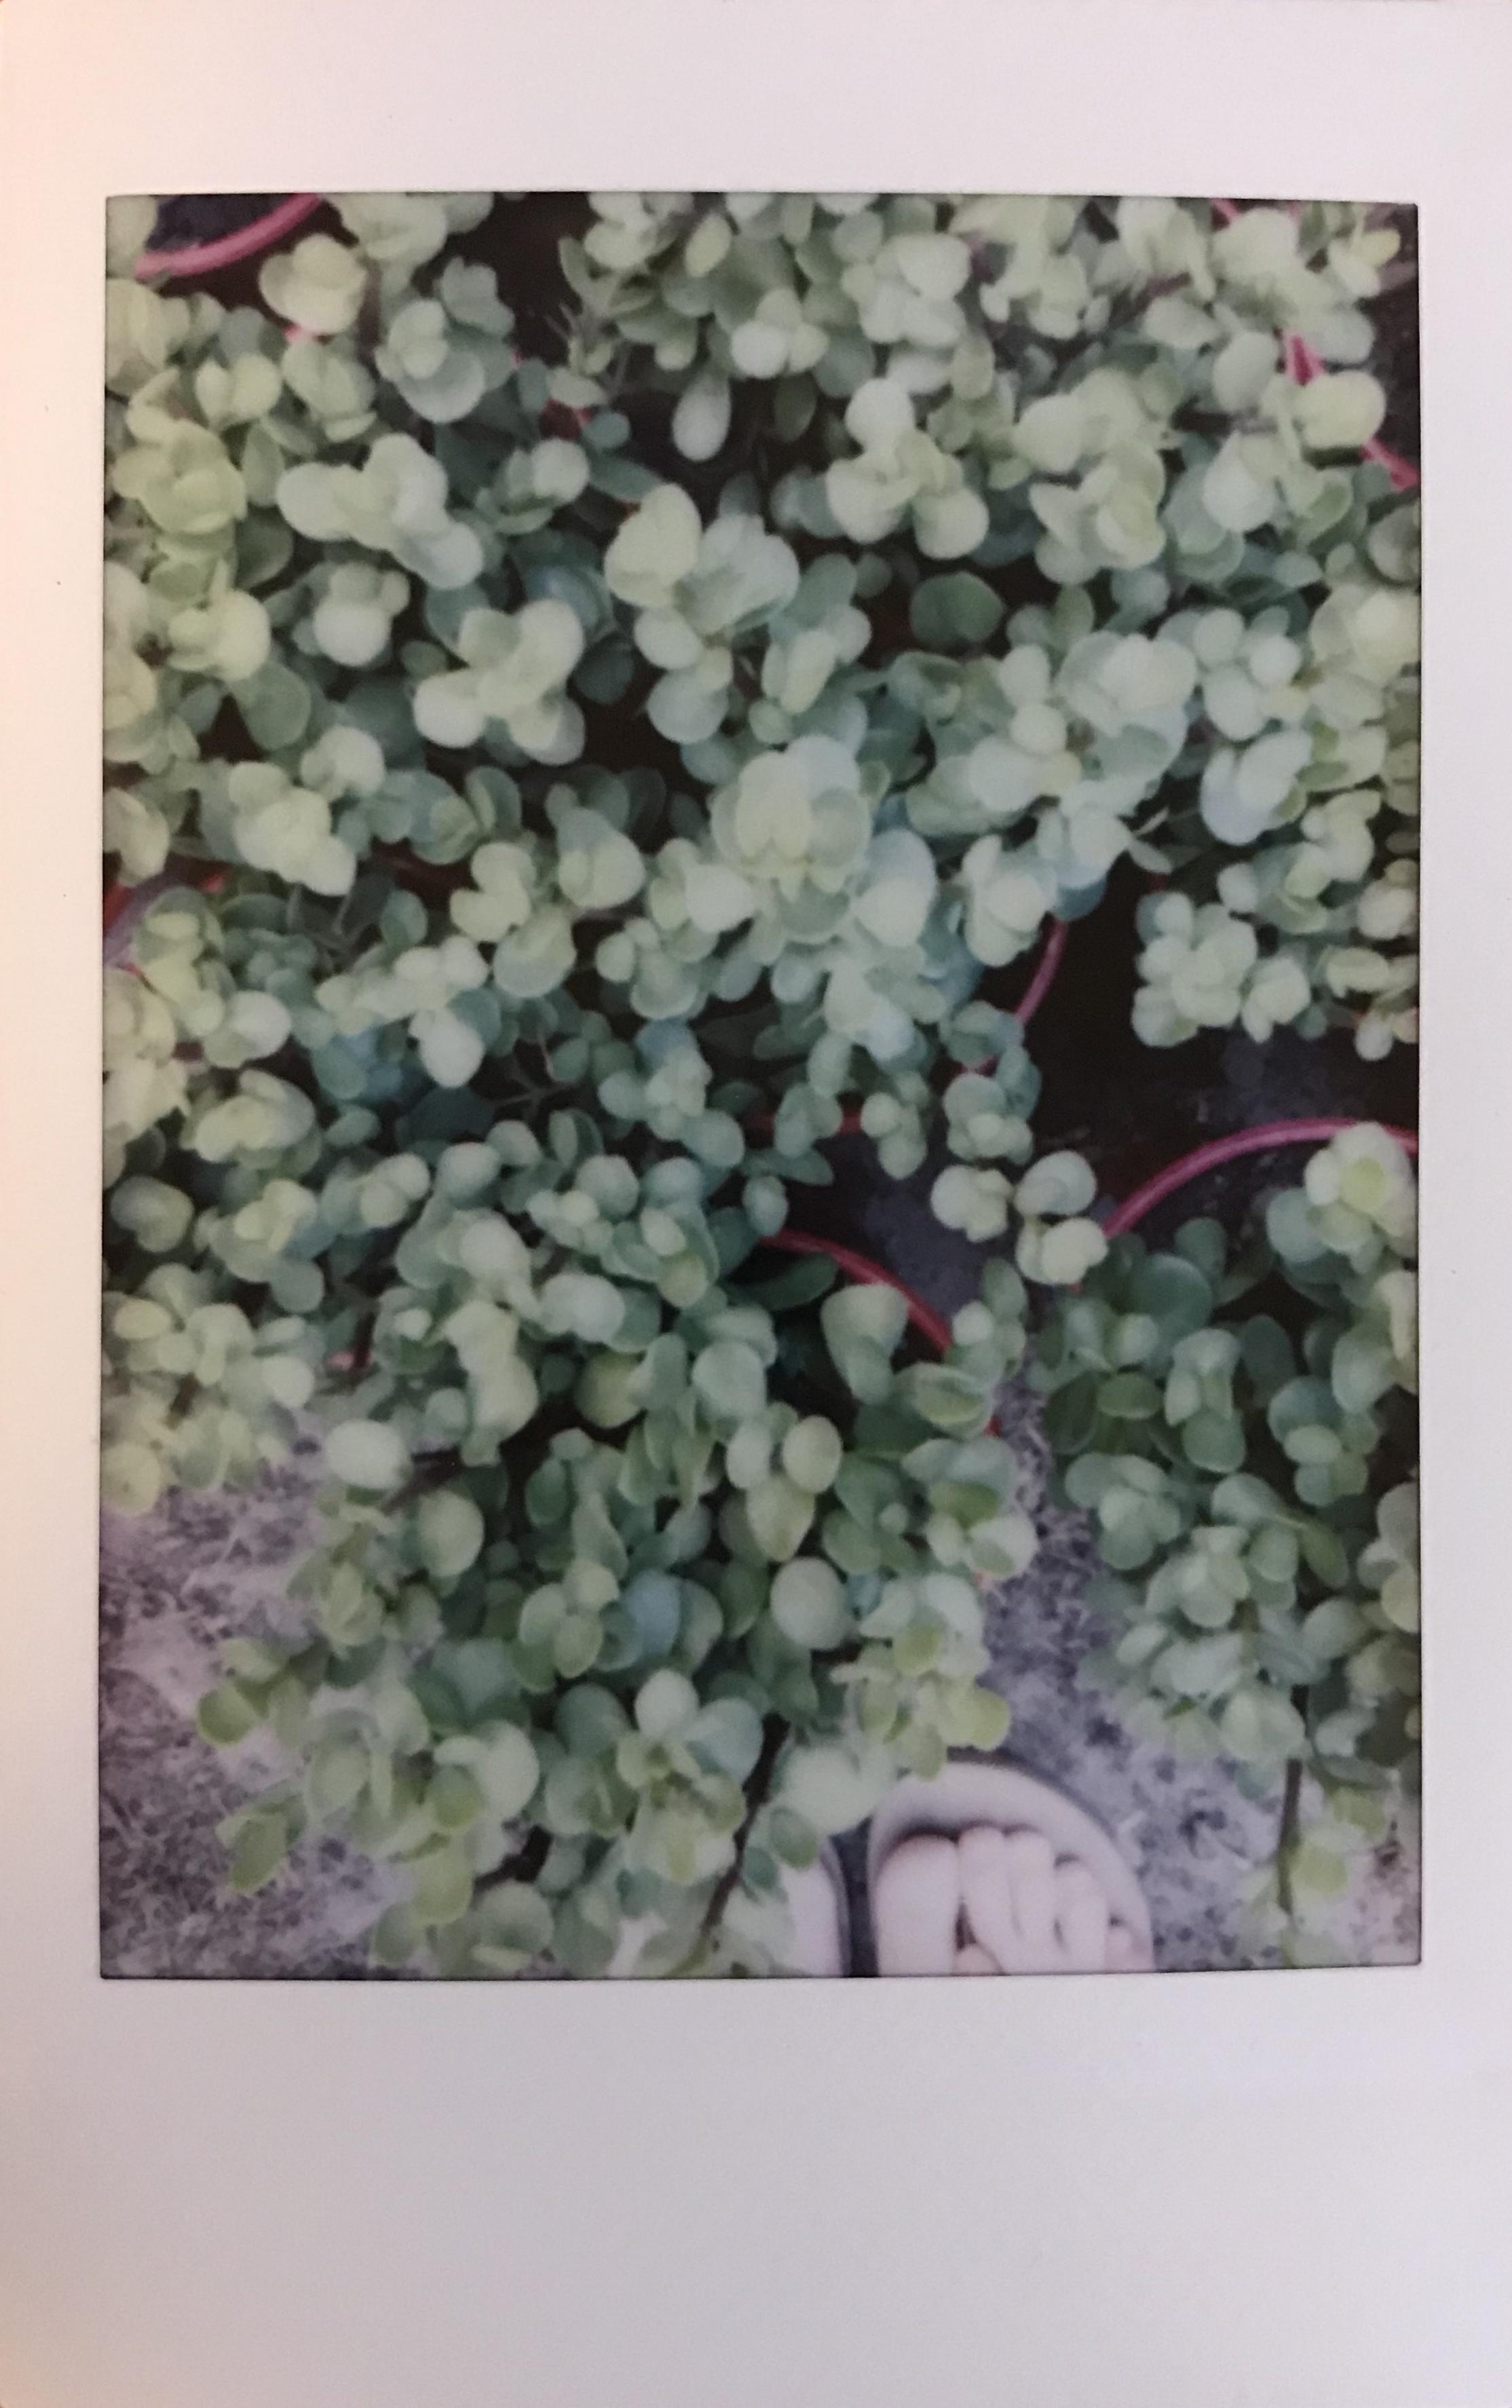 #2 WaterWise Plants